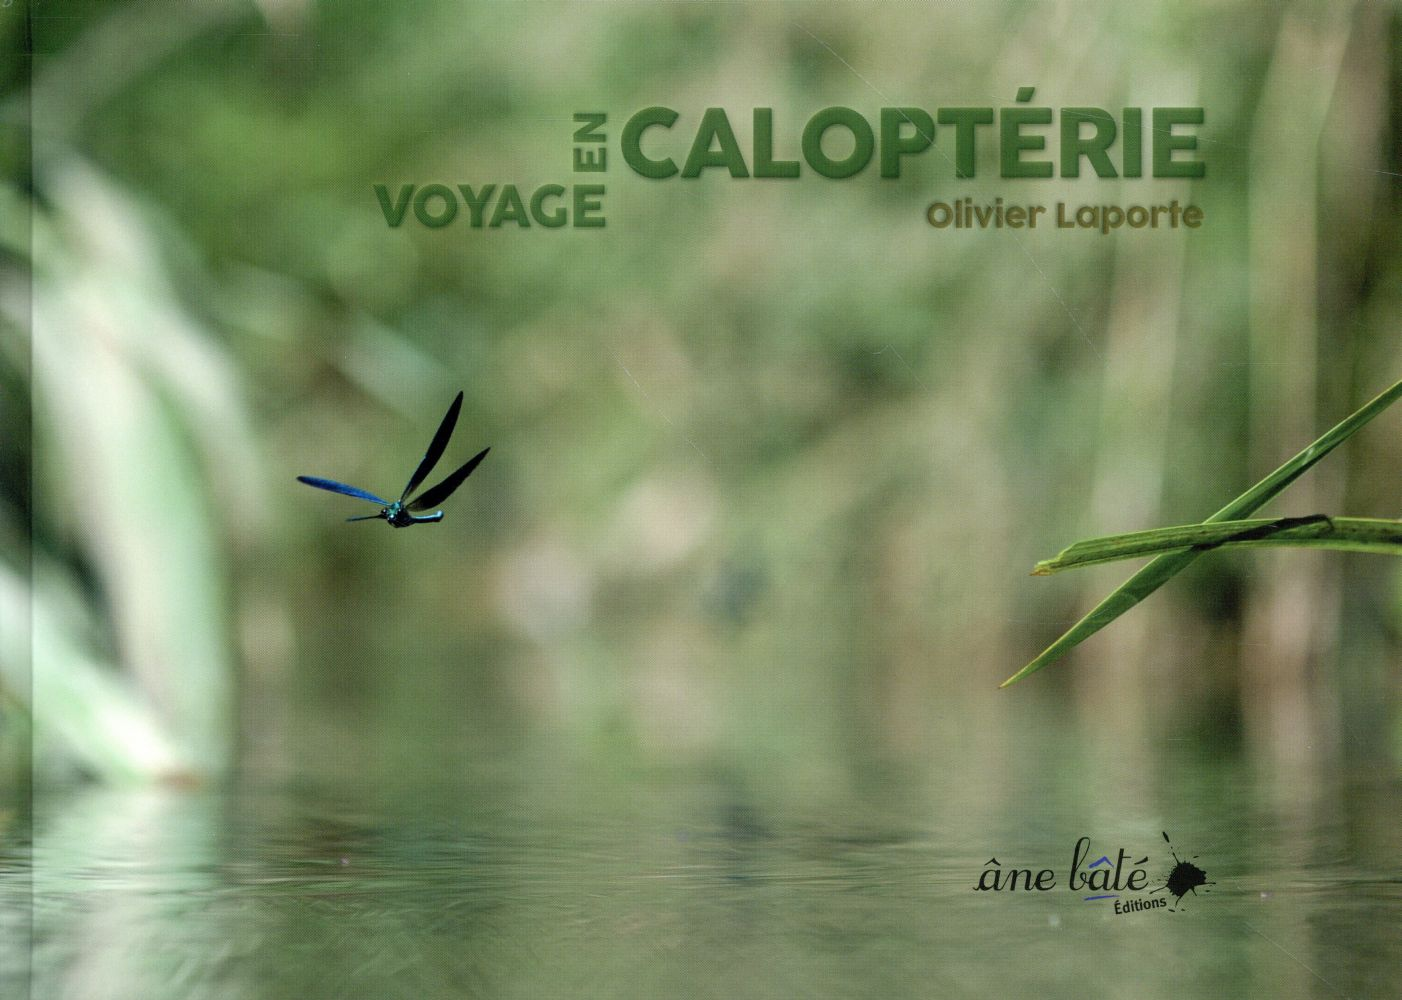 Voyage en Caloptérie